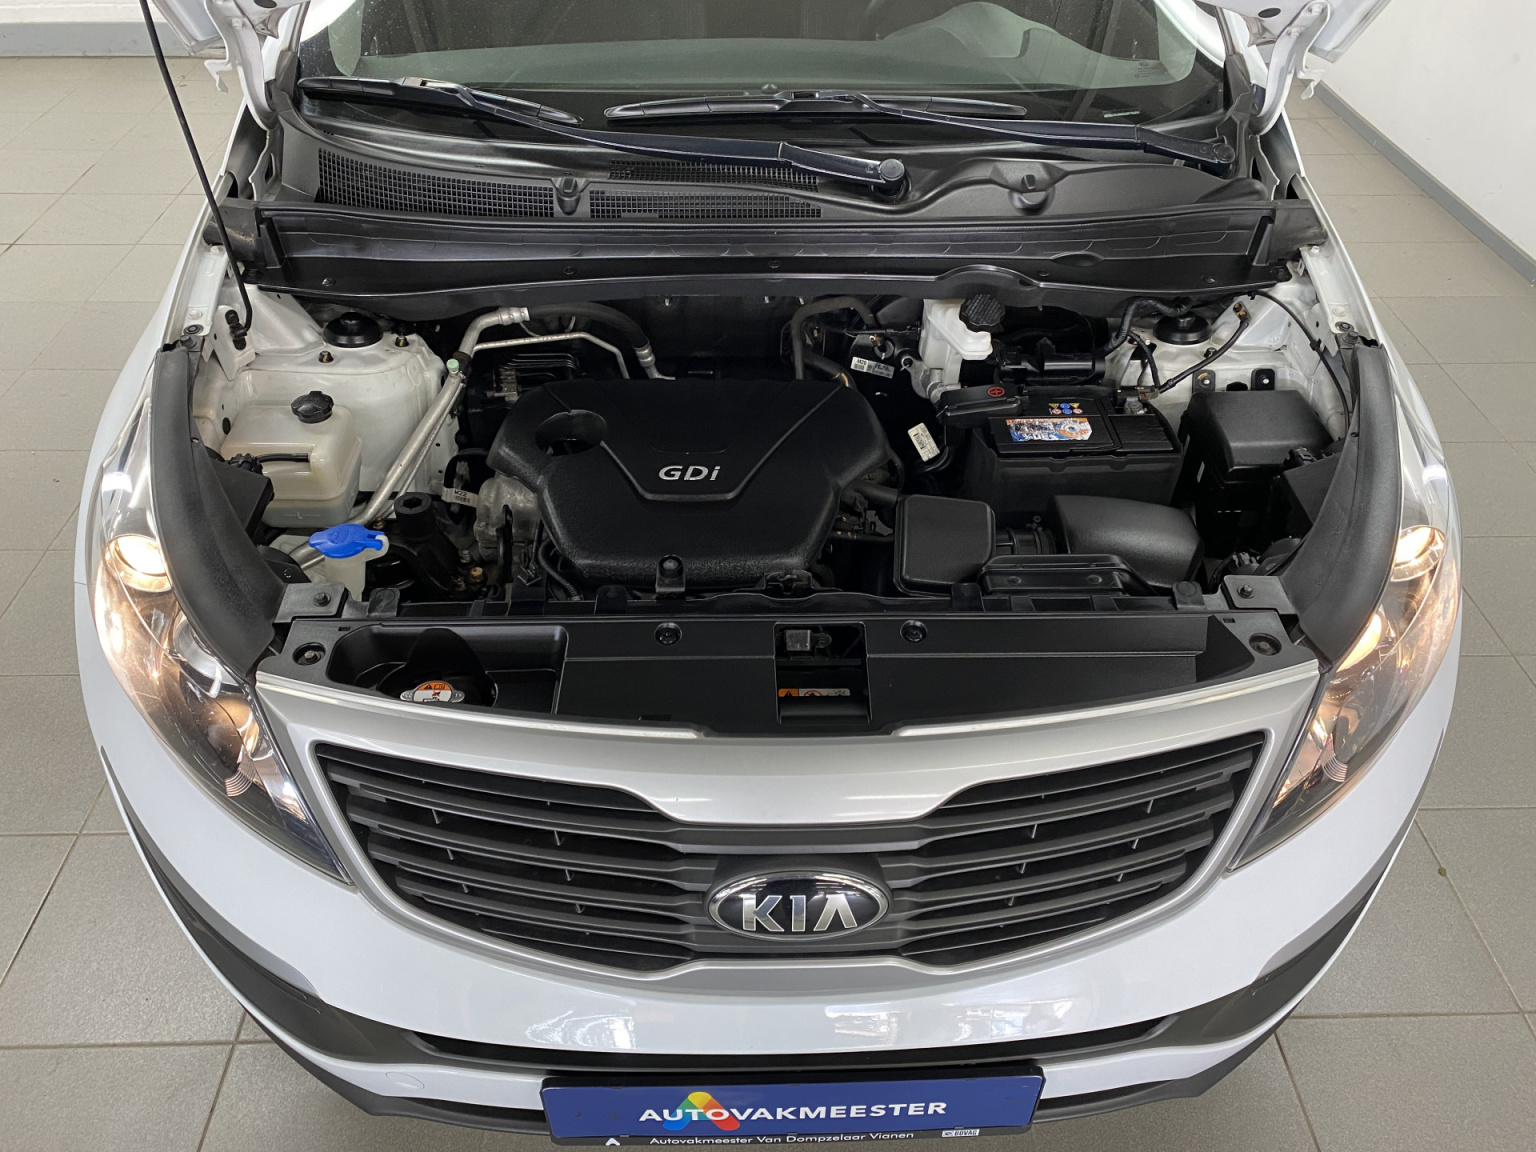 Kia-Sportage-23